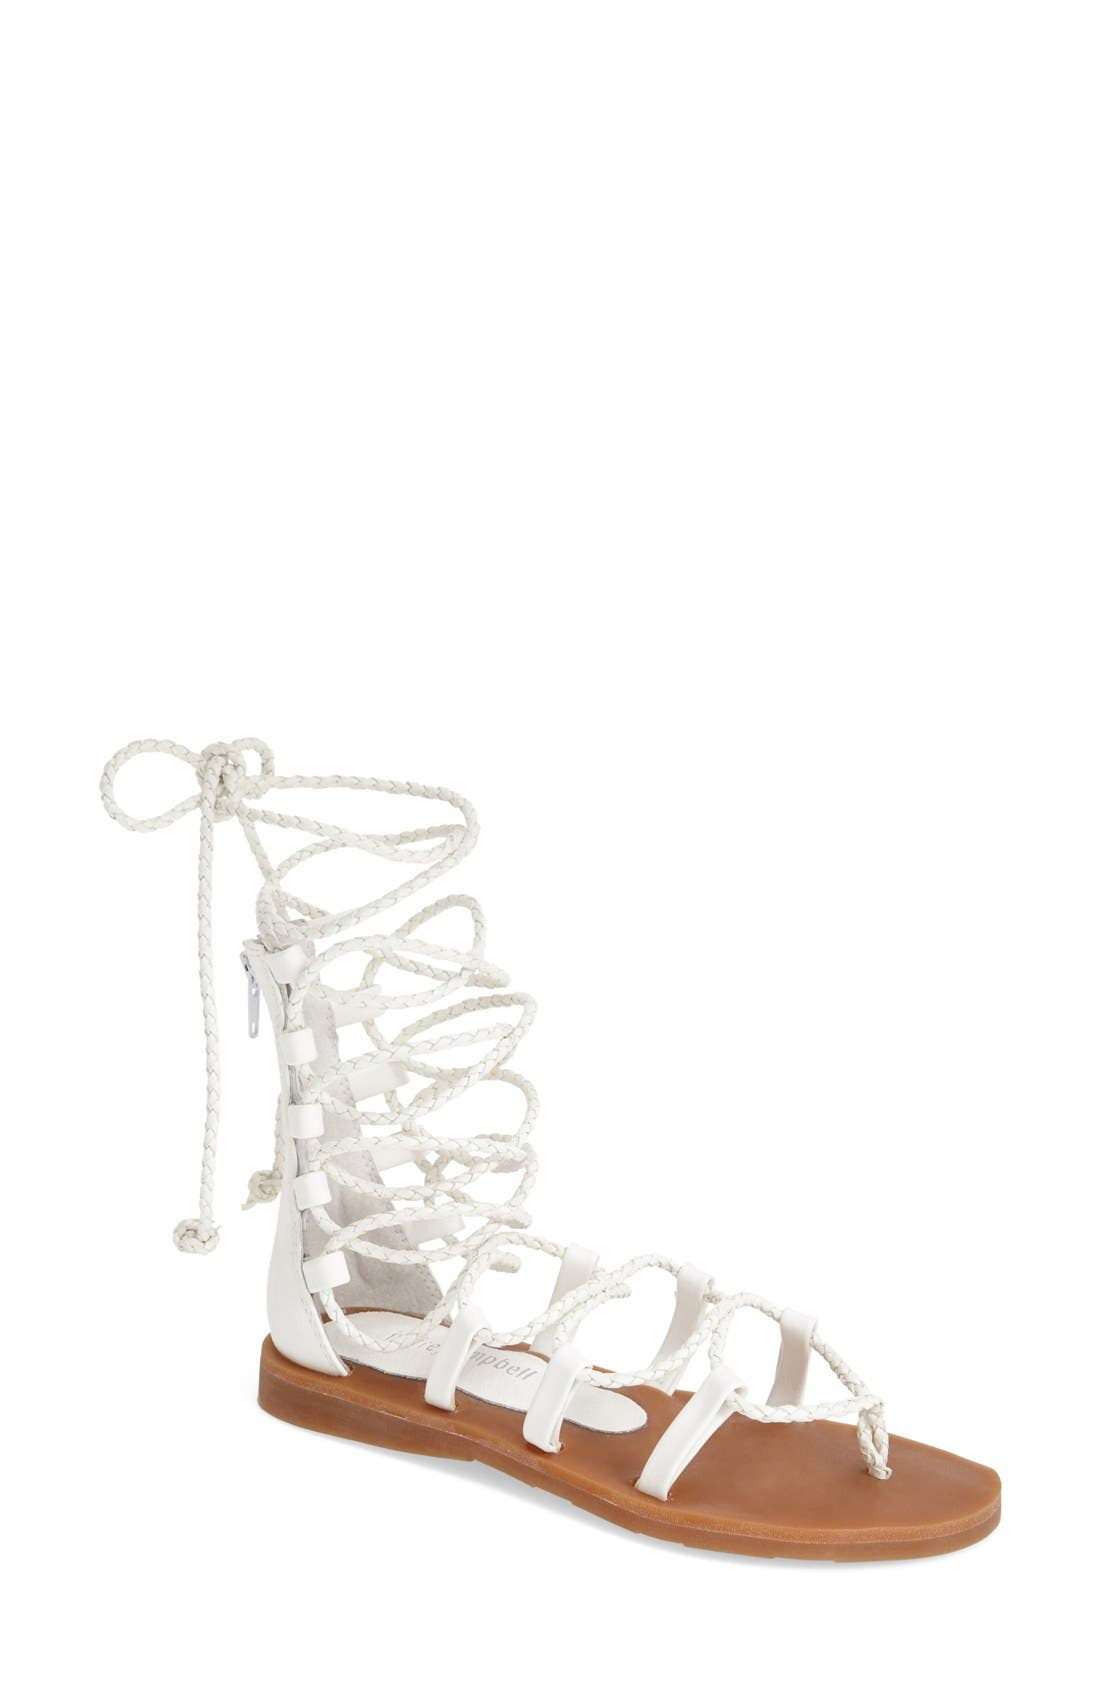 Alternate Image 1 Selected - Jeffrey Campbell 'Hola' Lace-Up Gladiator Sandal (Women)